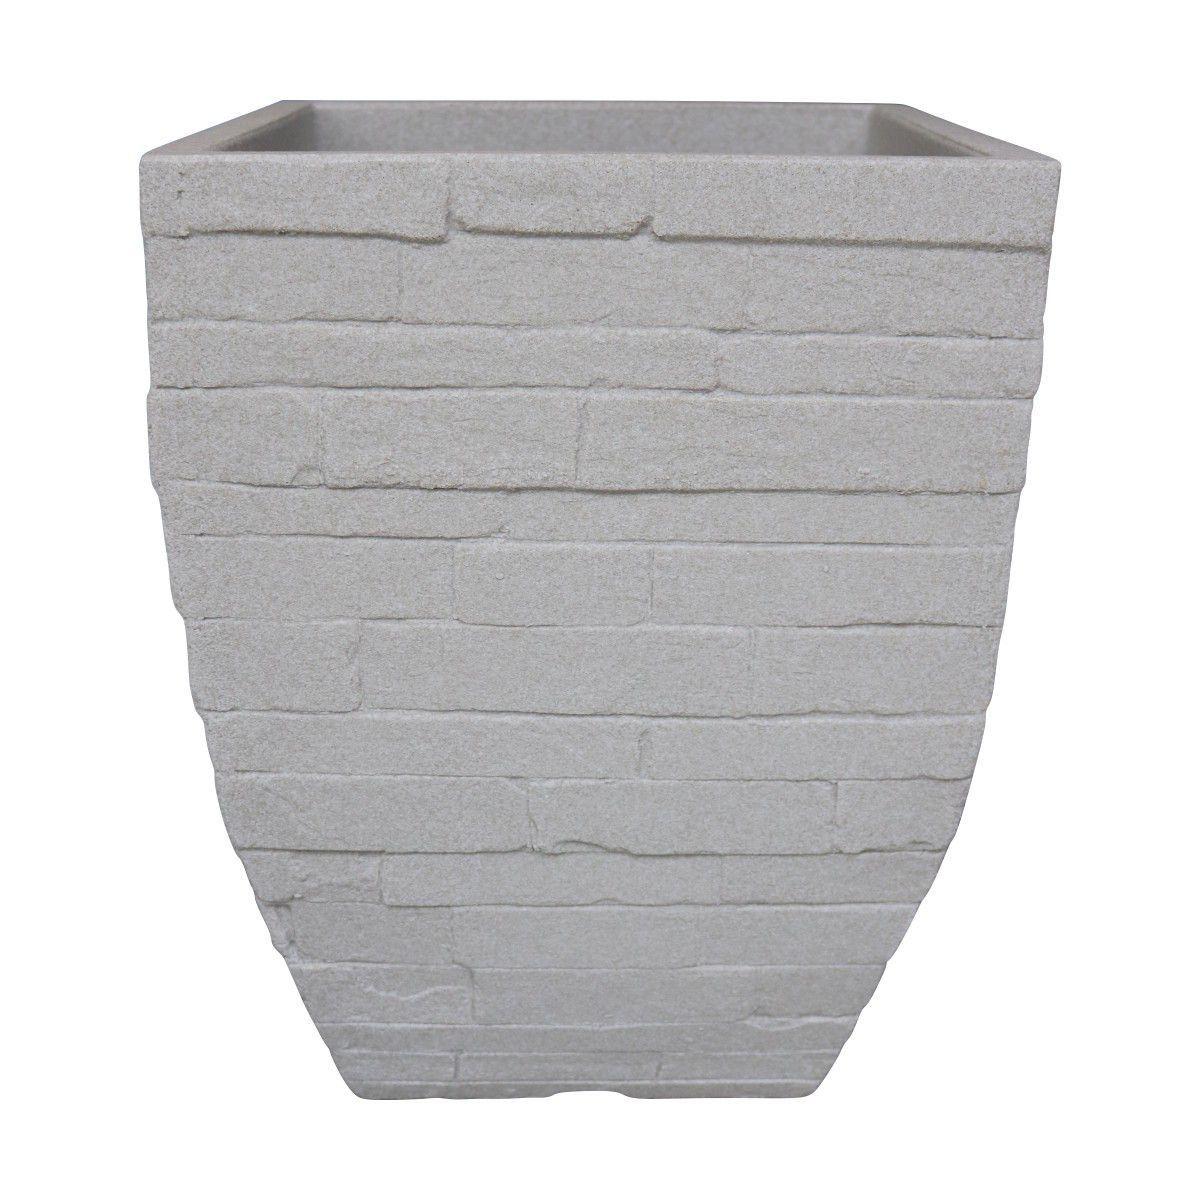 Vaso Minas Stone cor Cimento 43cm x 32,5cm